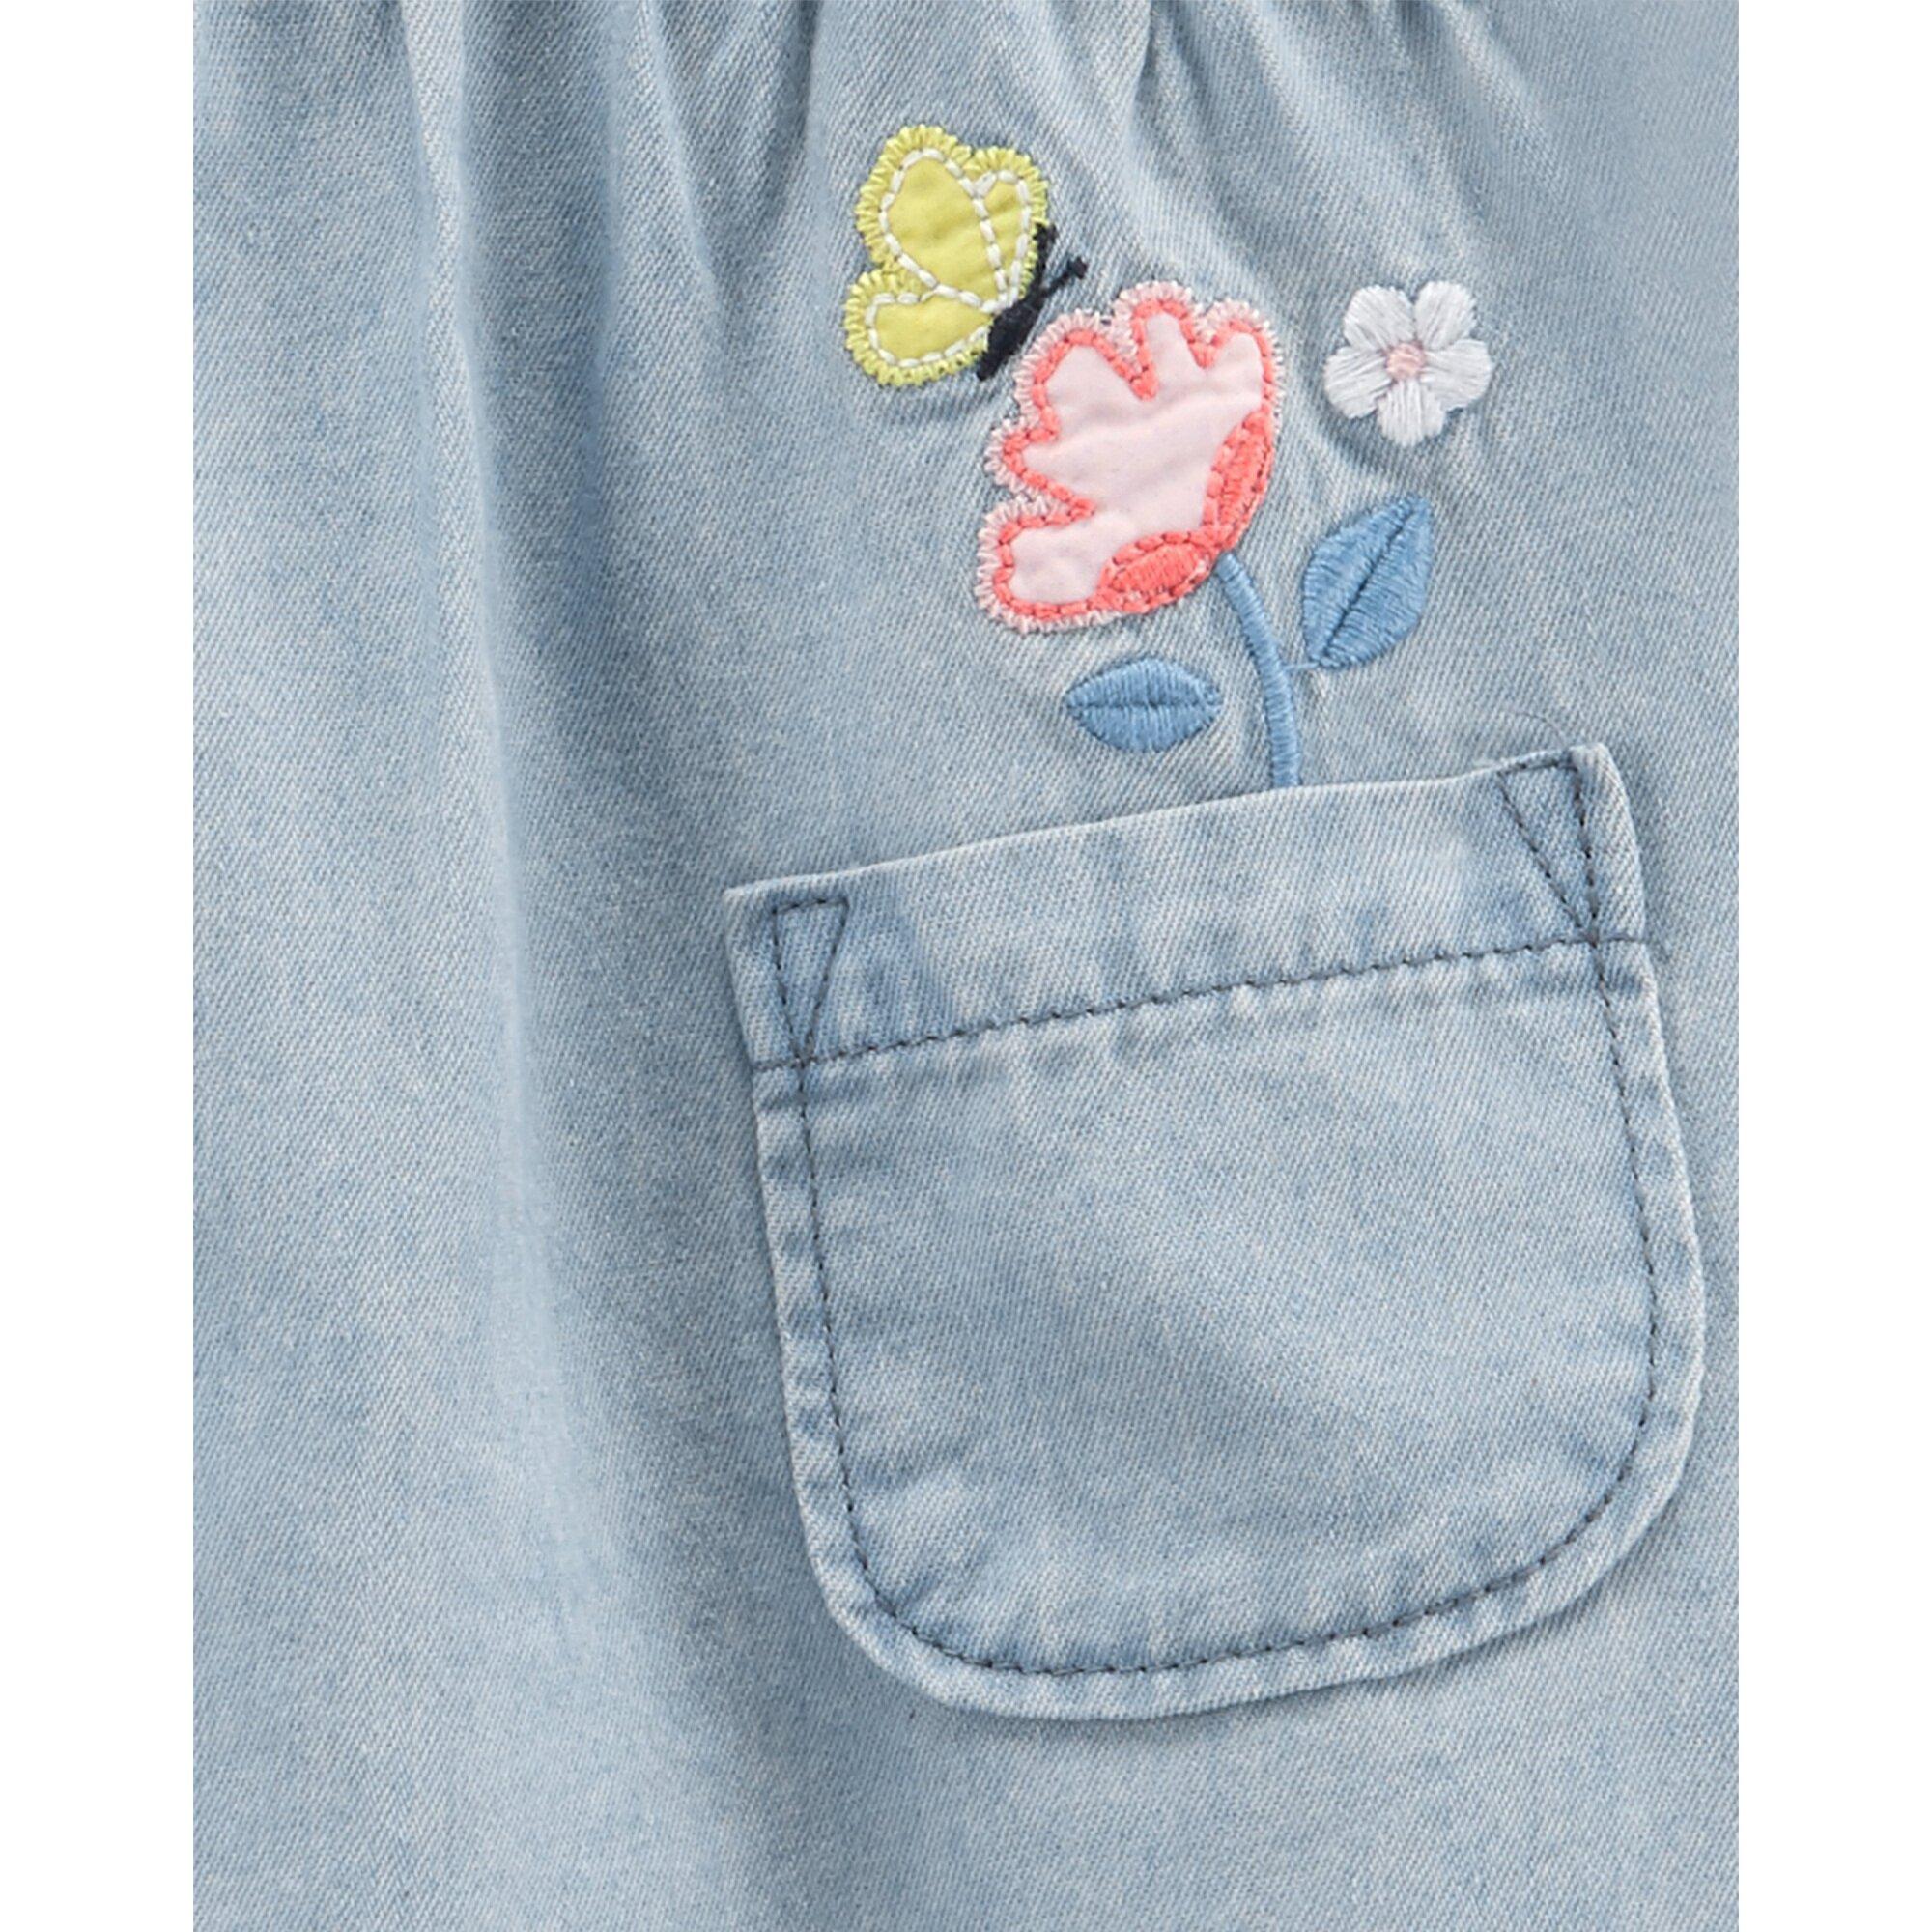 carter-s-2-tlg-set-jeans-tunika-flugelarm-und-leggings-blumen